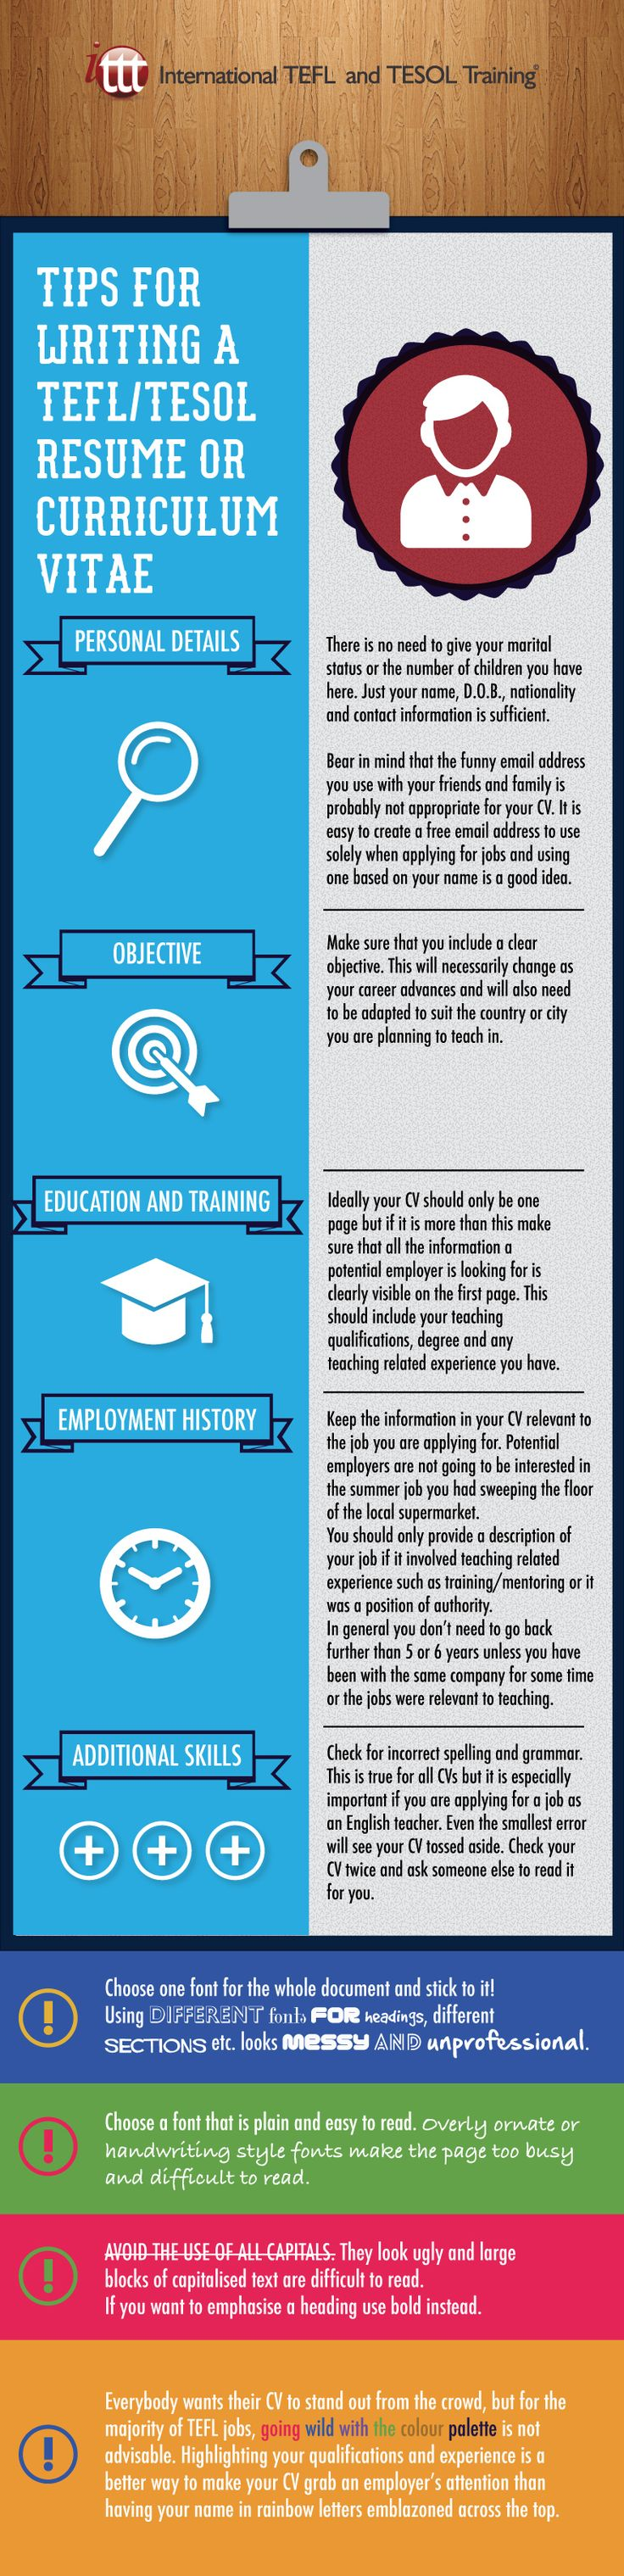 Tips for writing a TEFL/TESOL Resume/ Curriculum Vitae